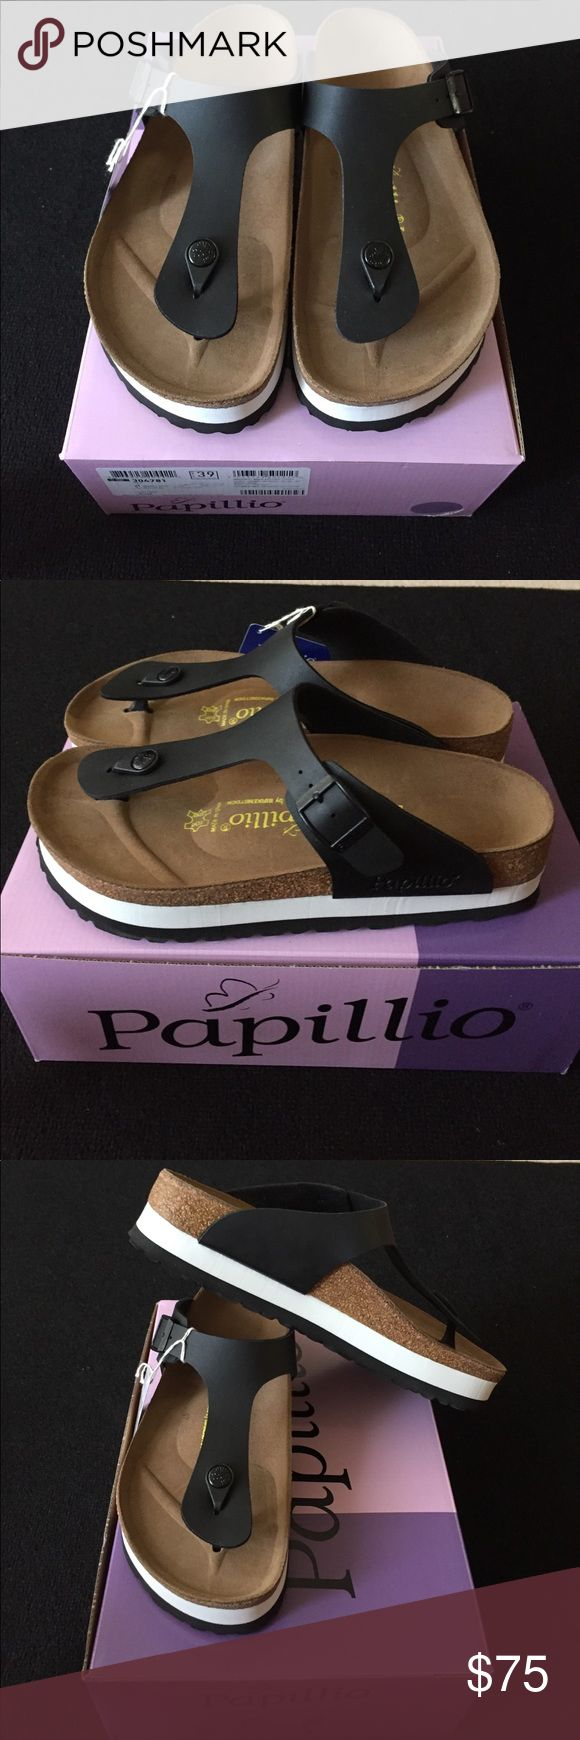 BIRKENSTOCK PAPILLIO GIZEH PLATFORMS BRAND NEW, 39 L8 M6 250 Birkenstock Shoes Sandals